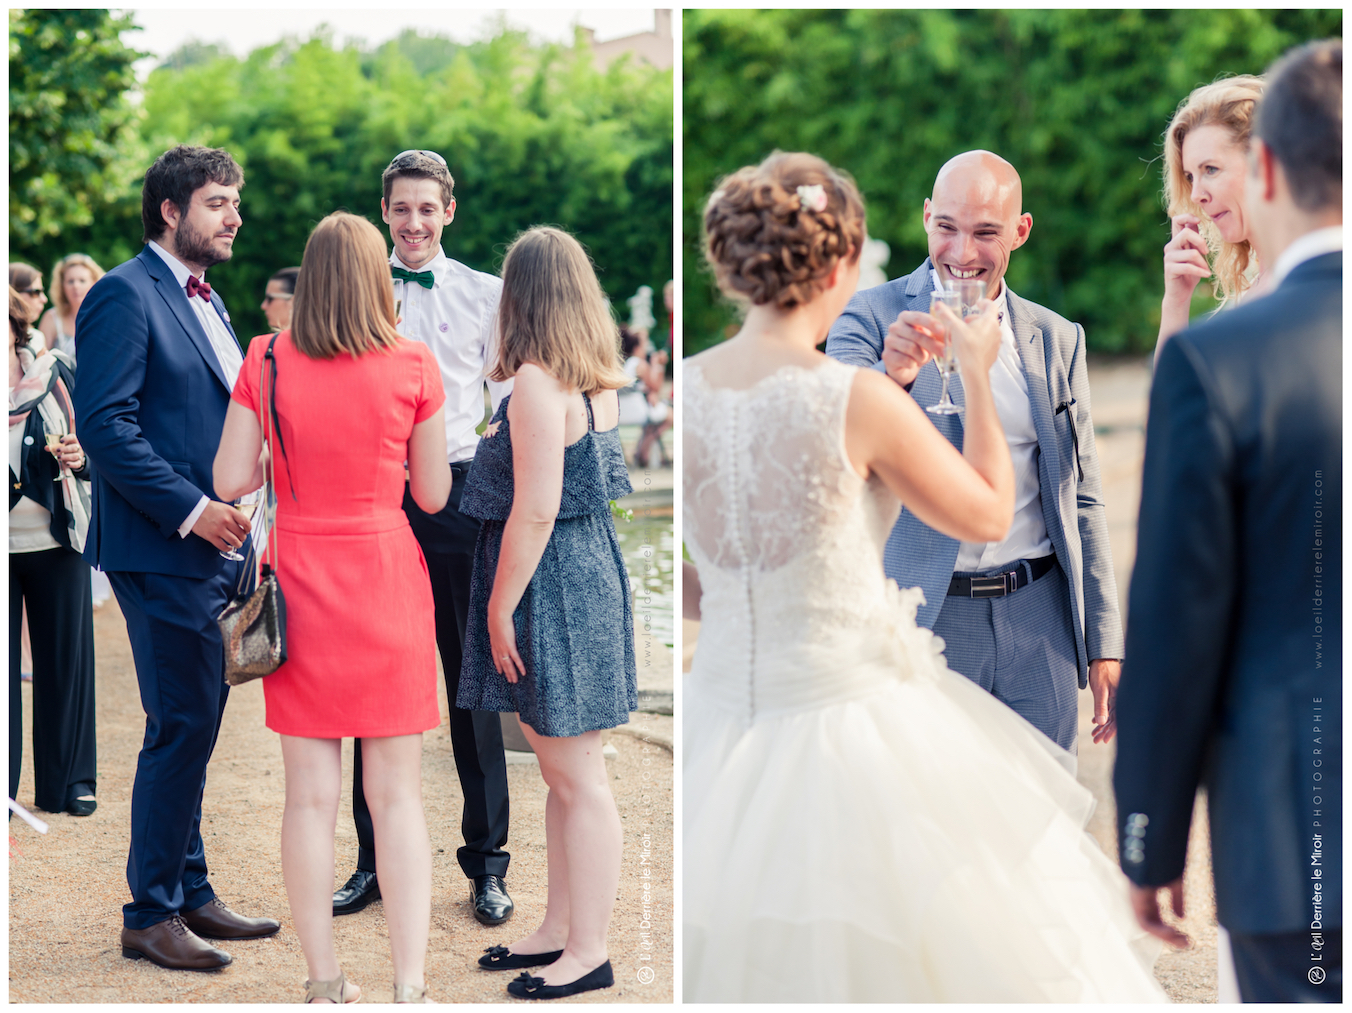 photographe-mariage-06-chateau-vaugrenier-15